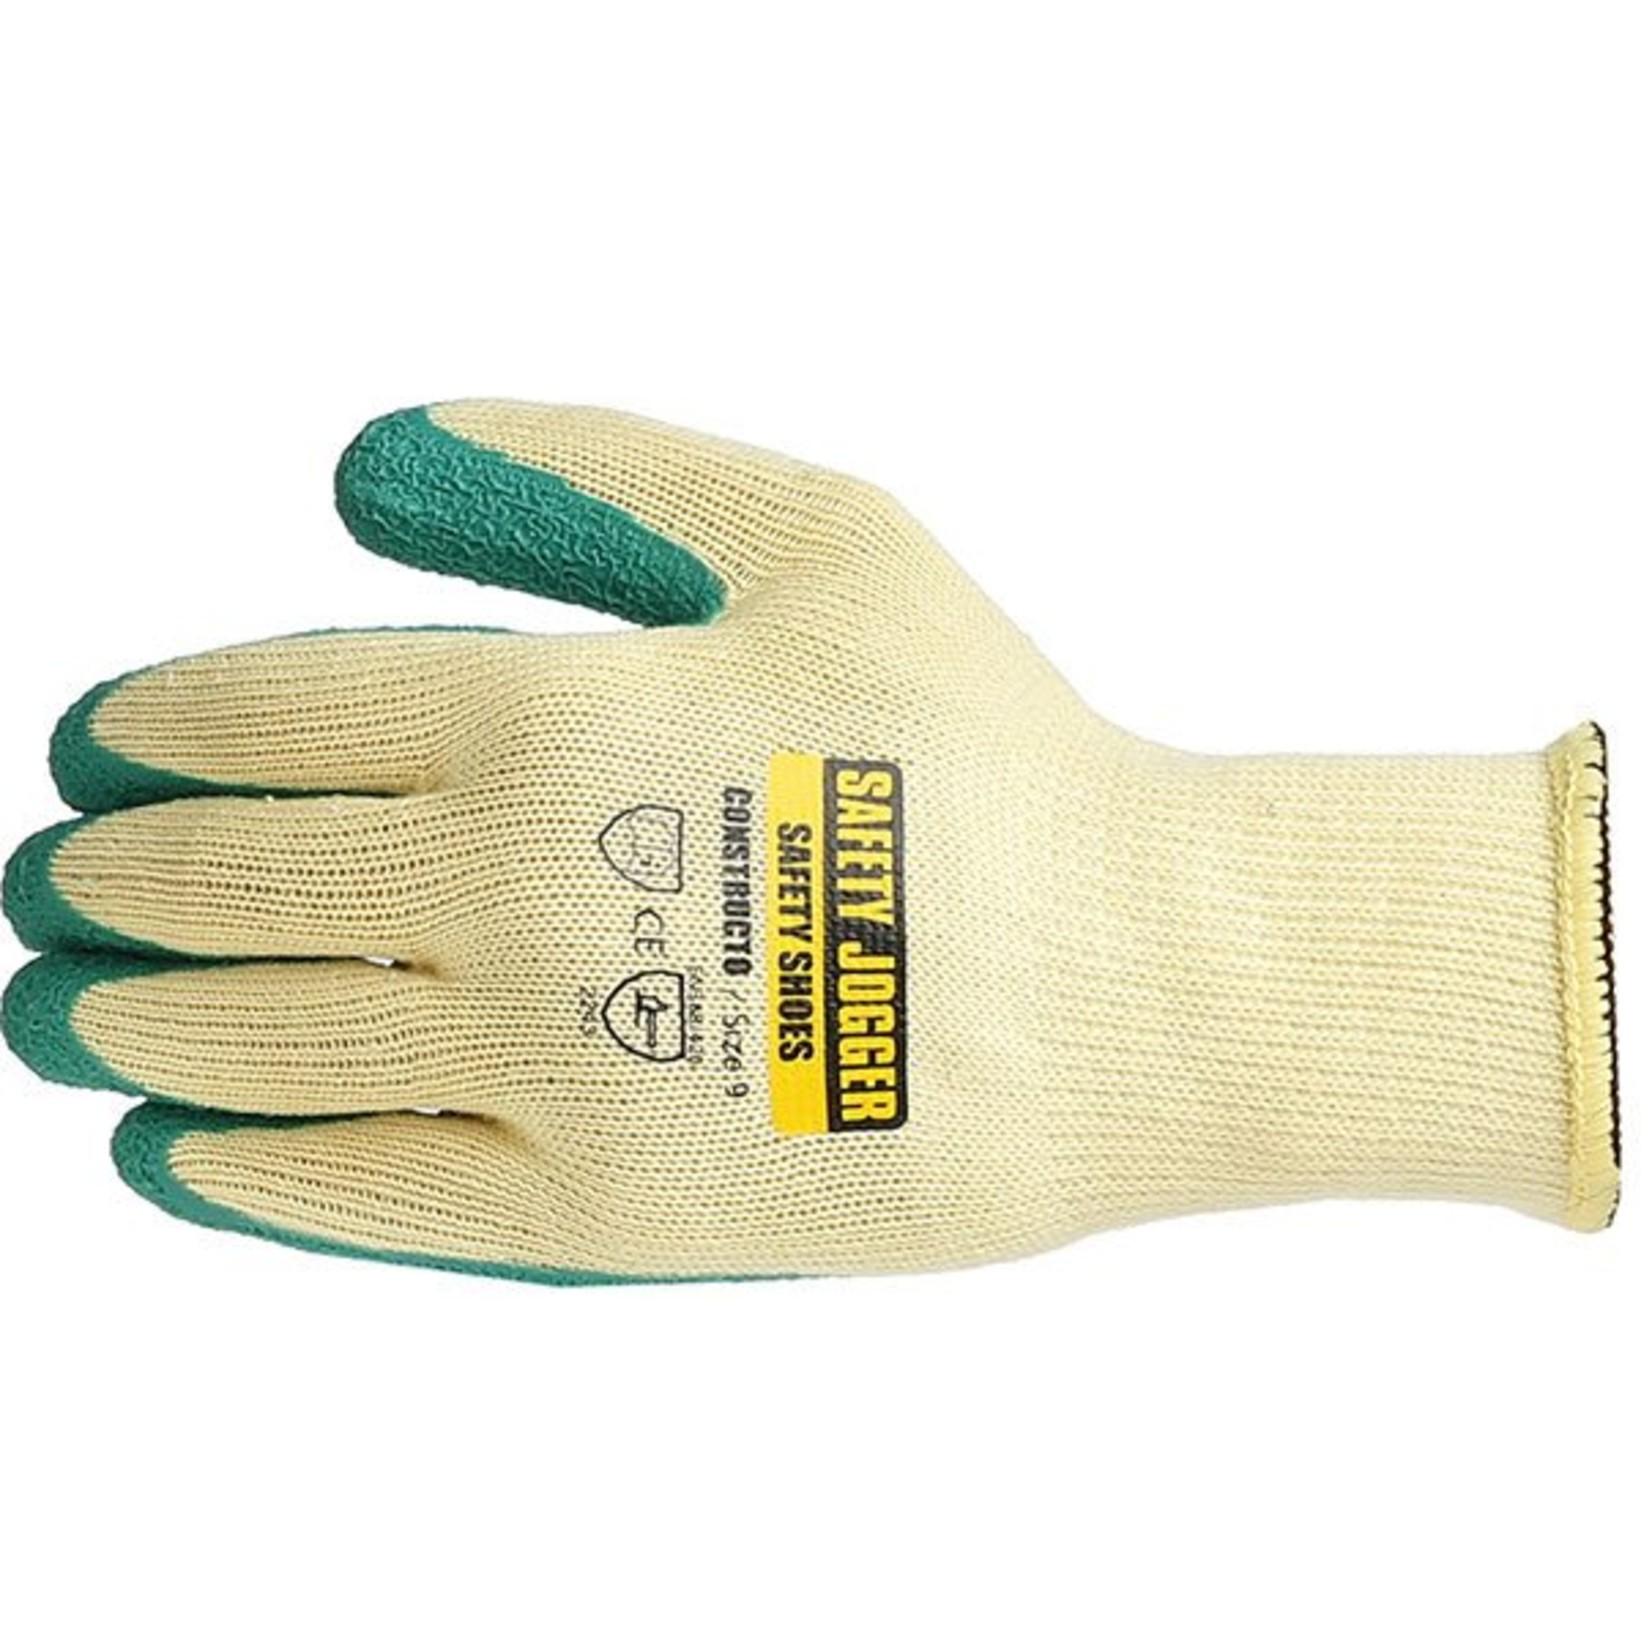 Safety Jogger Handschoenen Sale !!